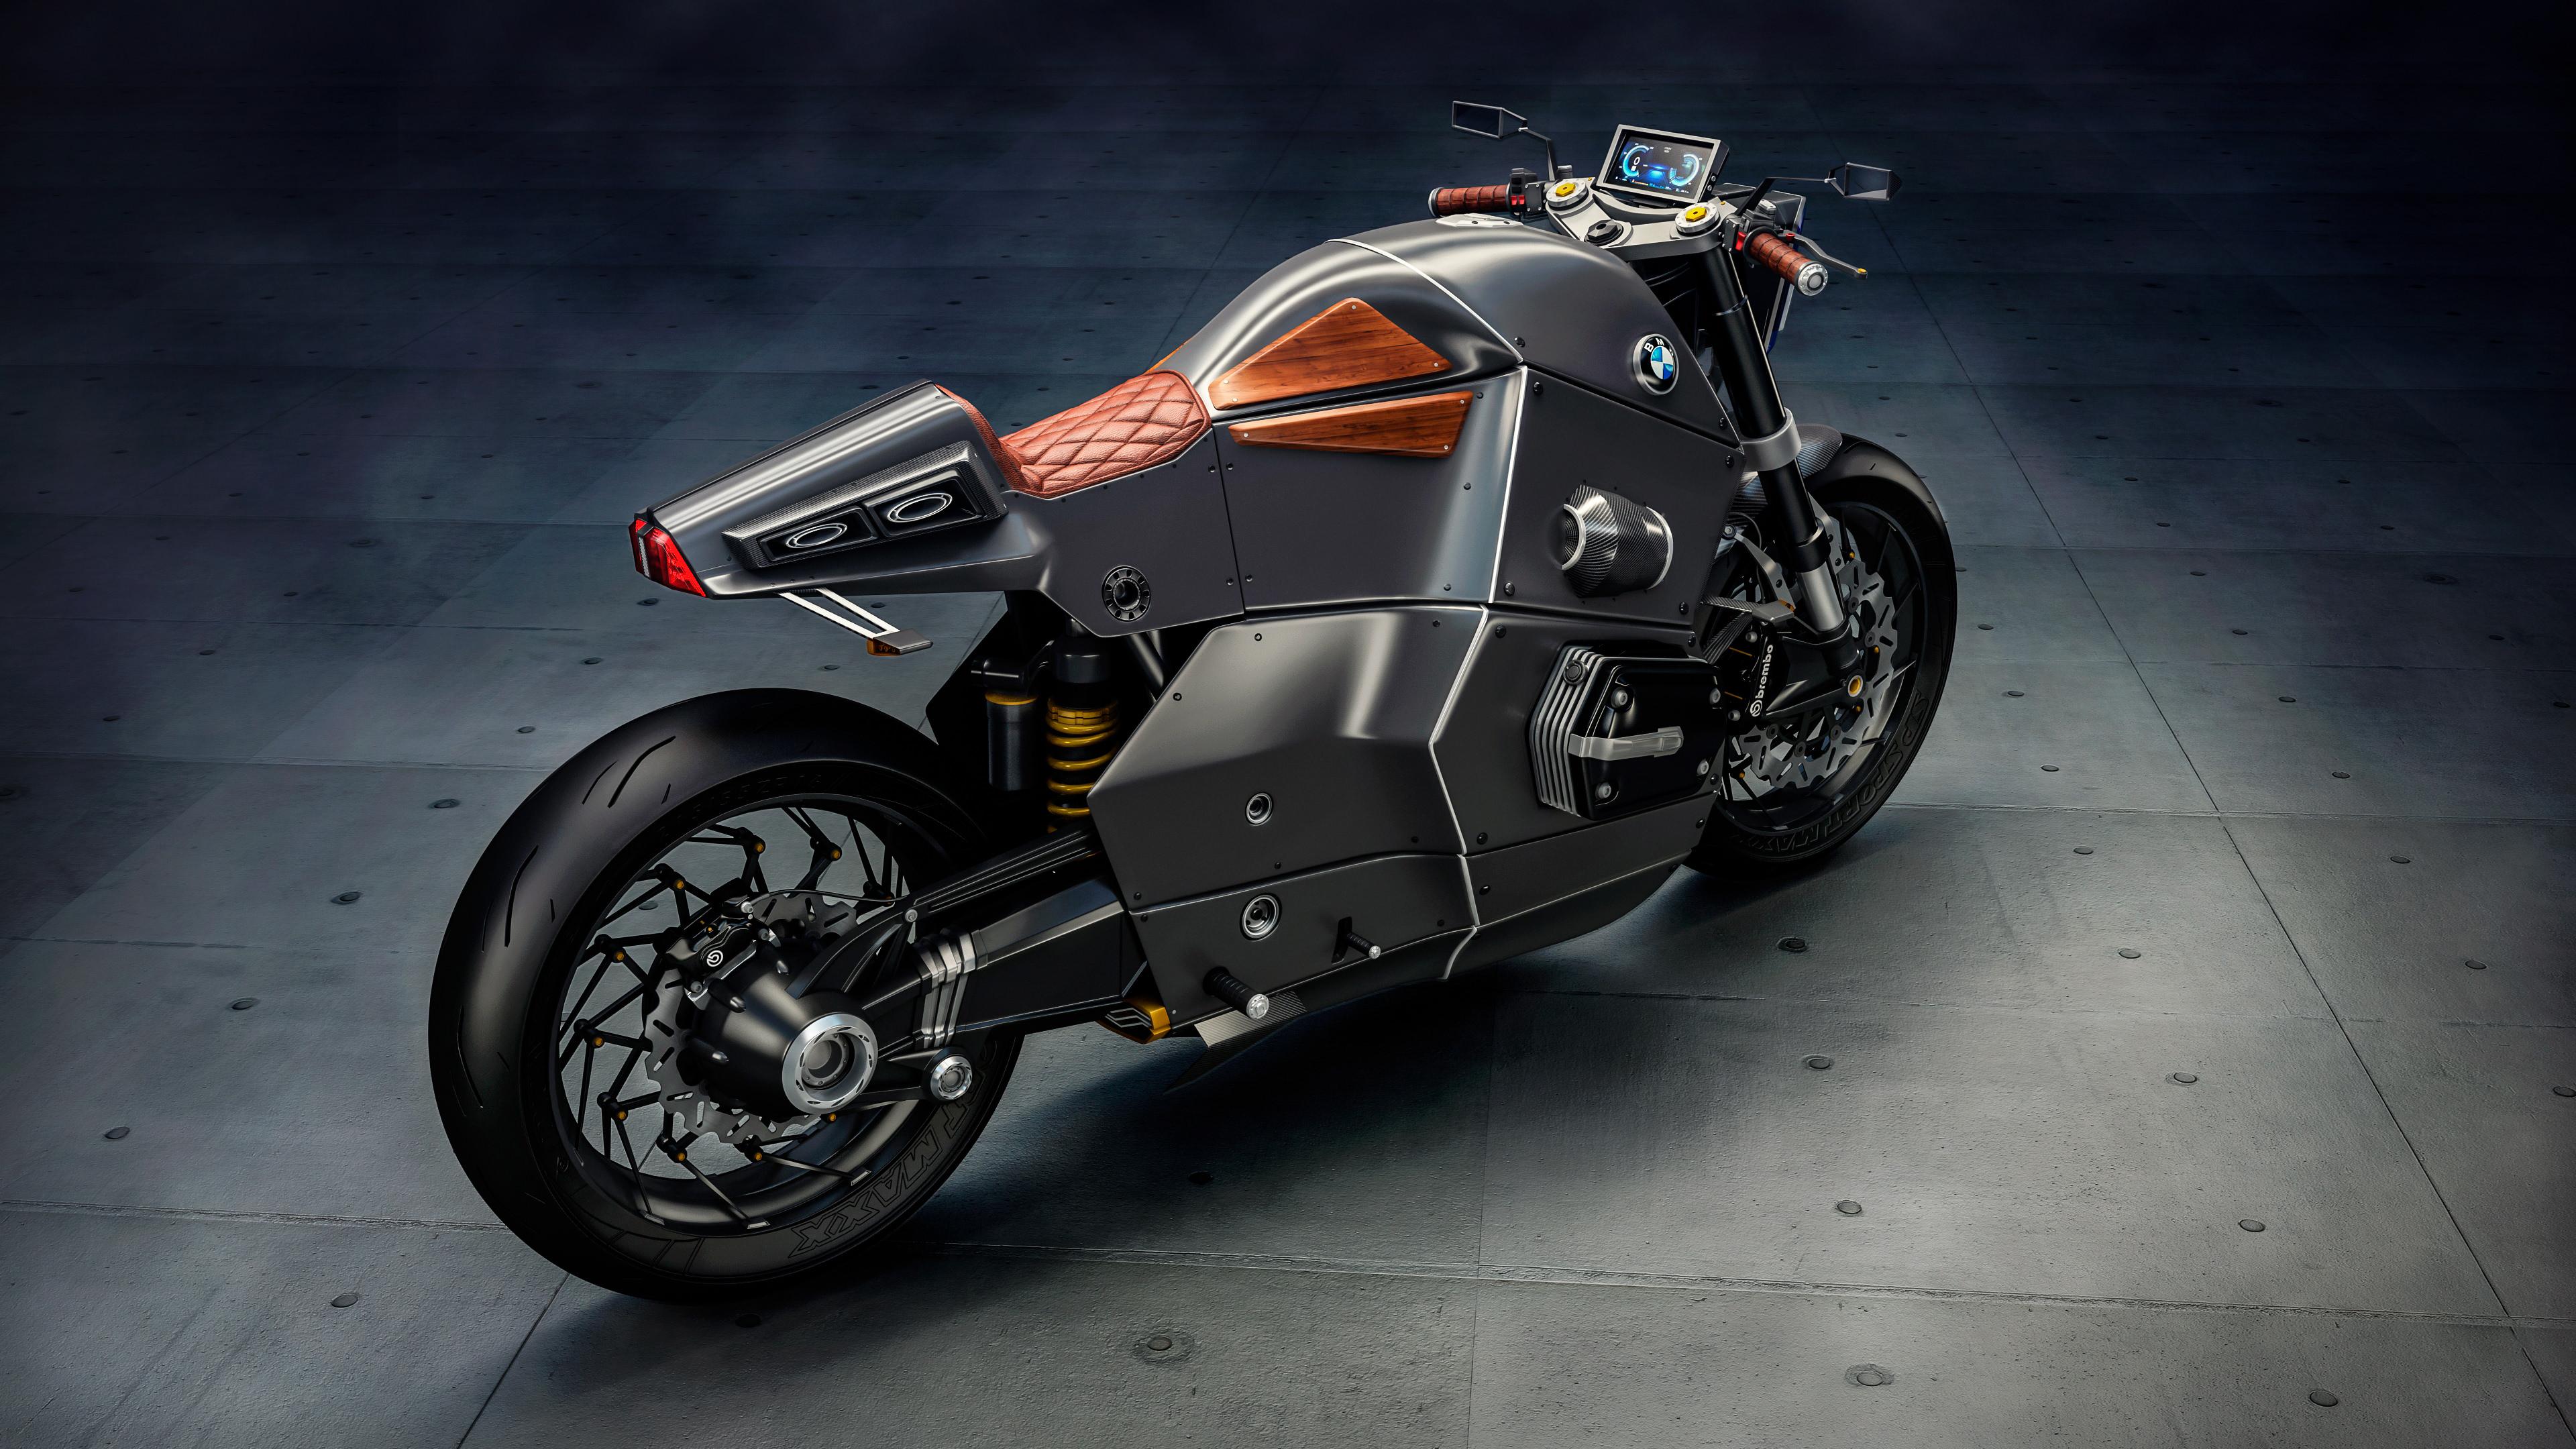 Wallpaper 4k BMW Urban Racer Future Bike 4K 2017, Bike, bmw